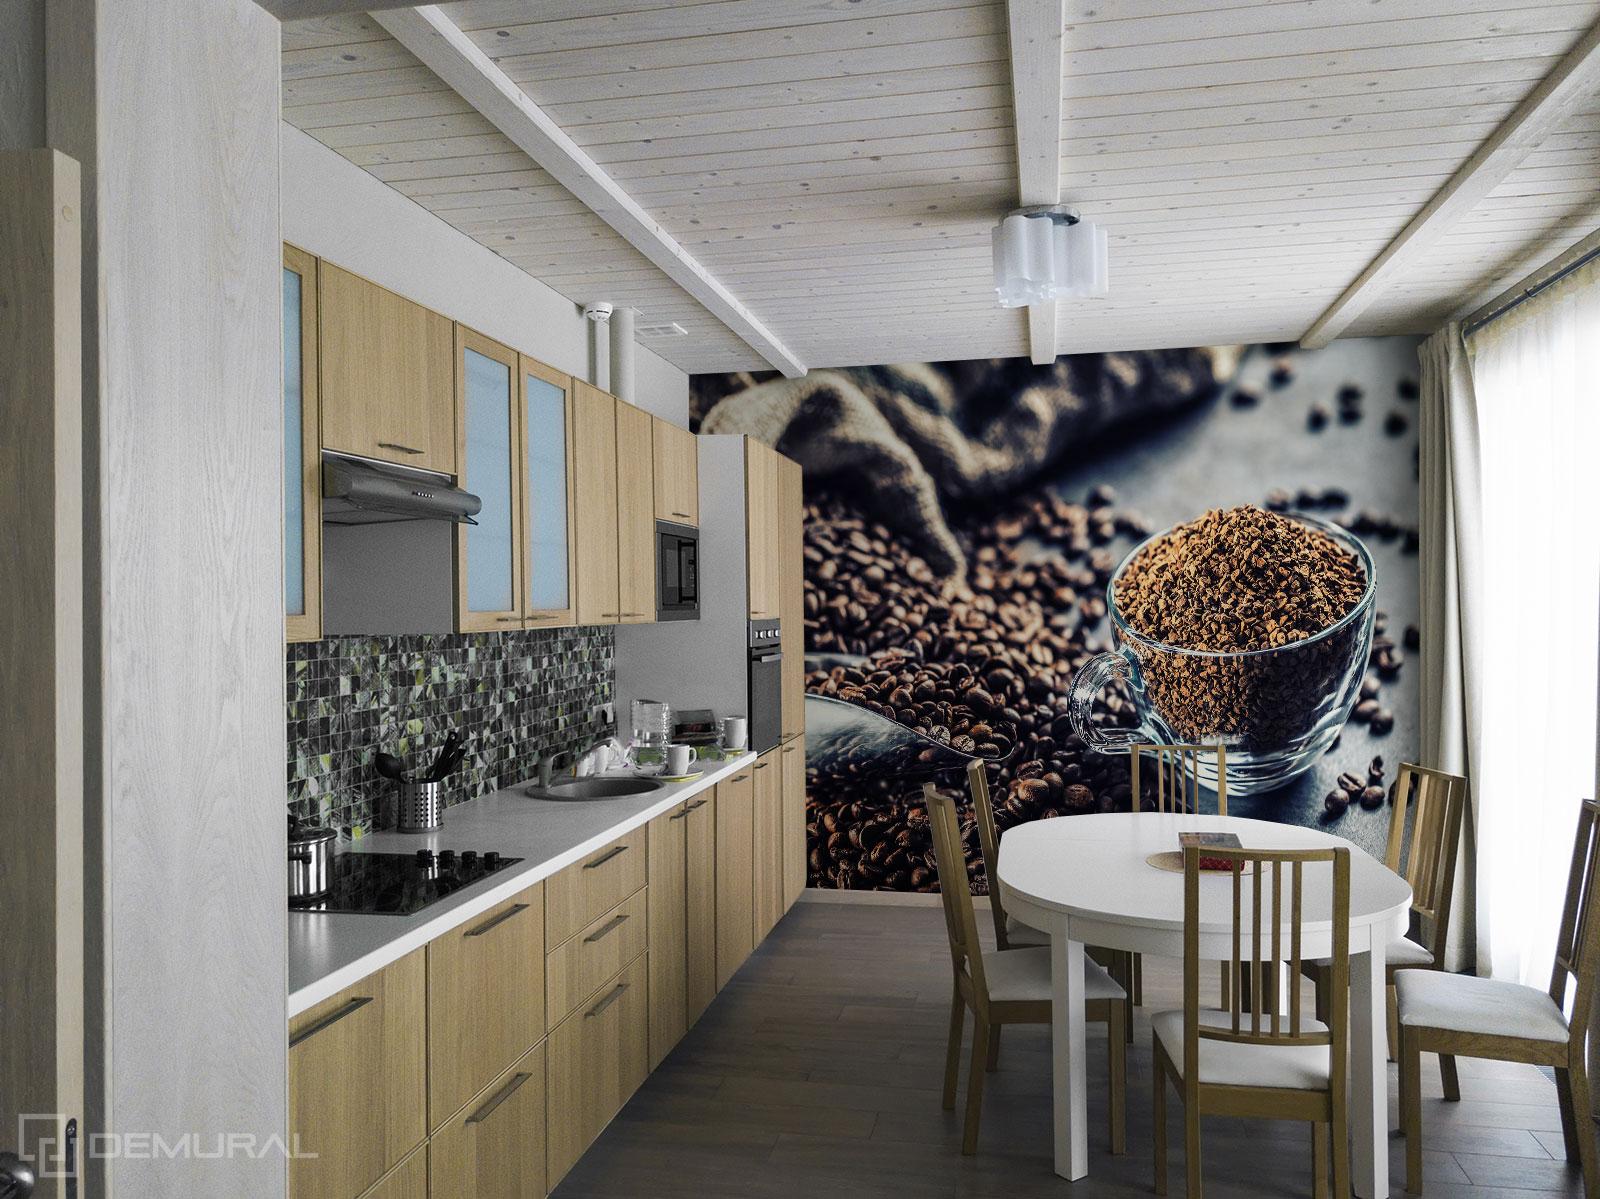 Fototapete Aroma des Kaffees - Fototapete für große Küche - Demural